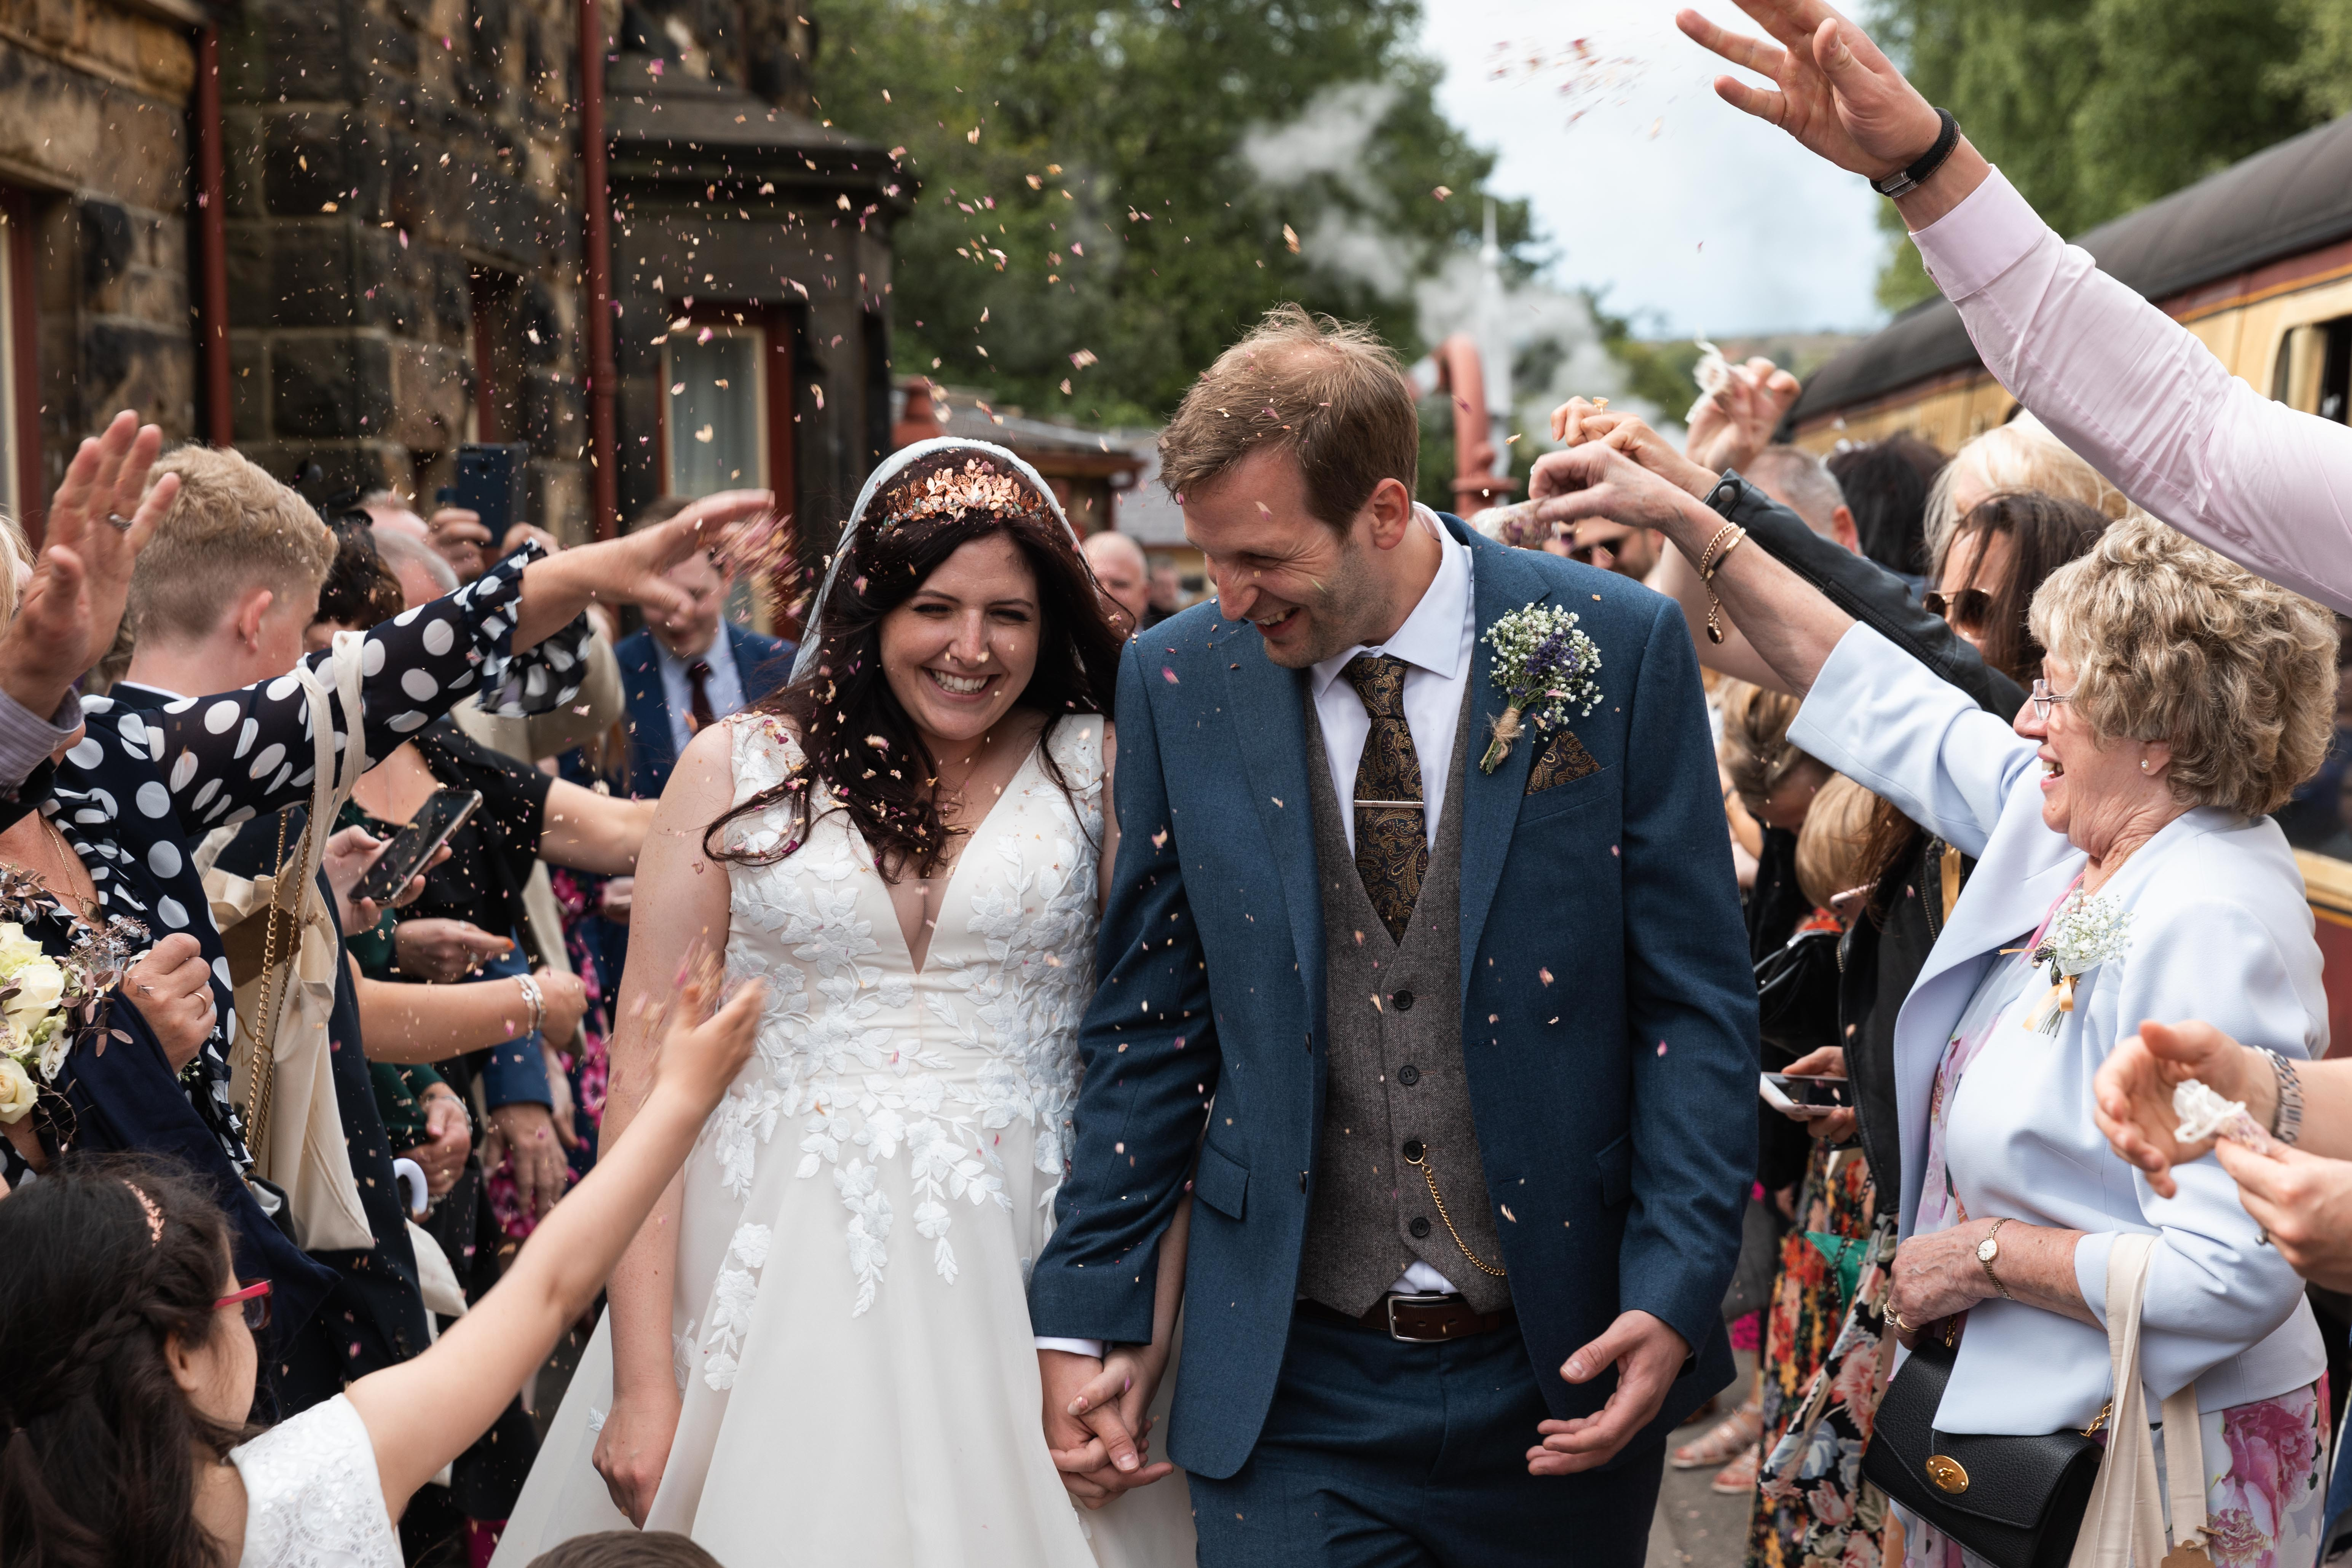 Wedding confetti photograph